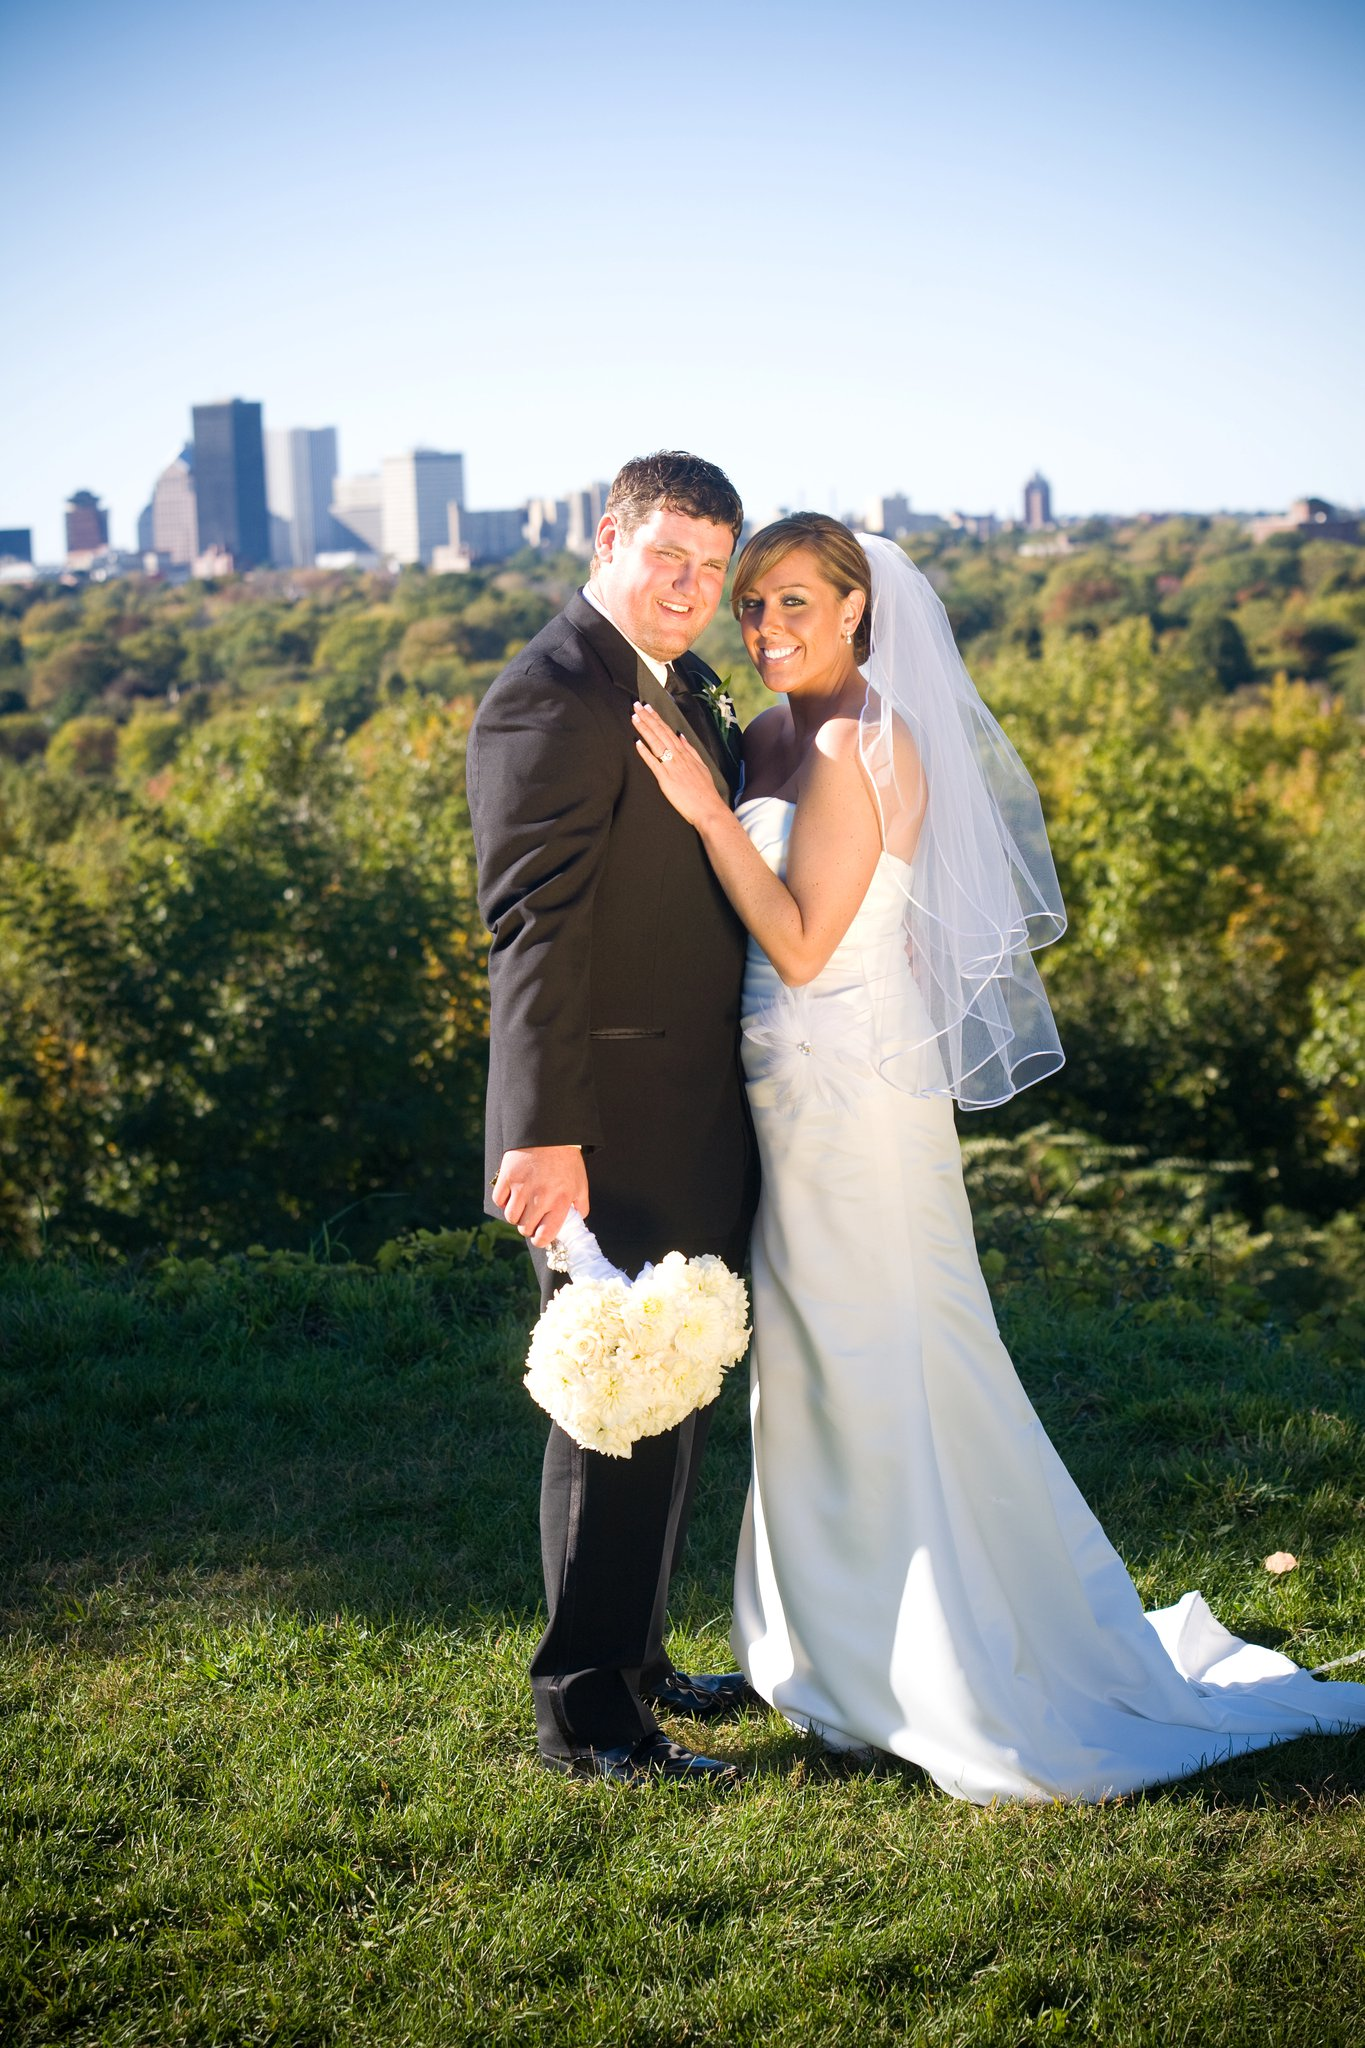 rochester,bride, on loaction,wedding, nails, makeup, sunless,2,go,spray tan, gel nail,waxing,lash ti